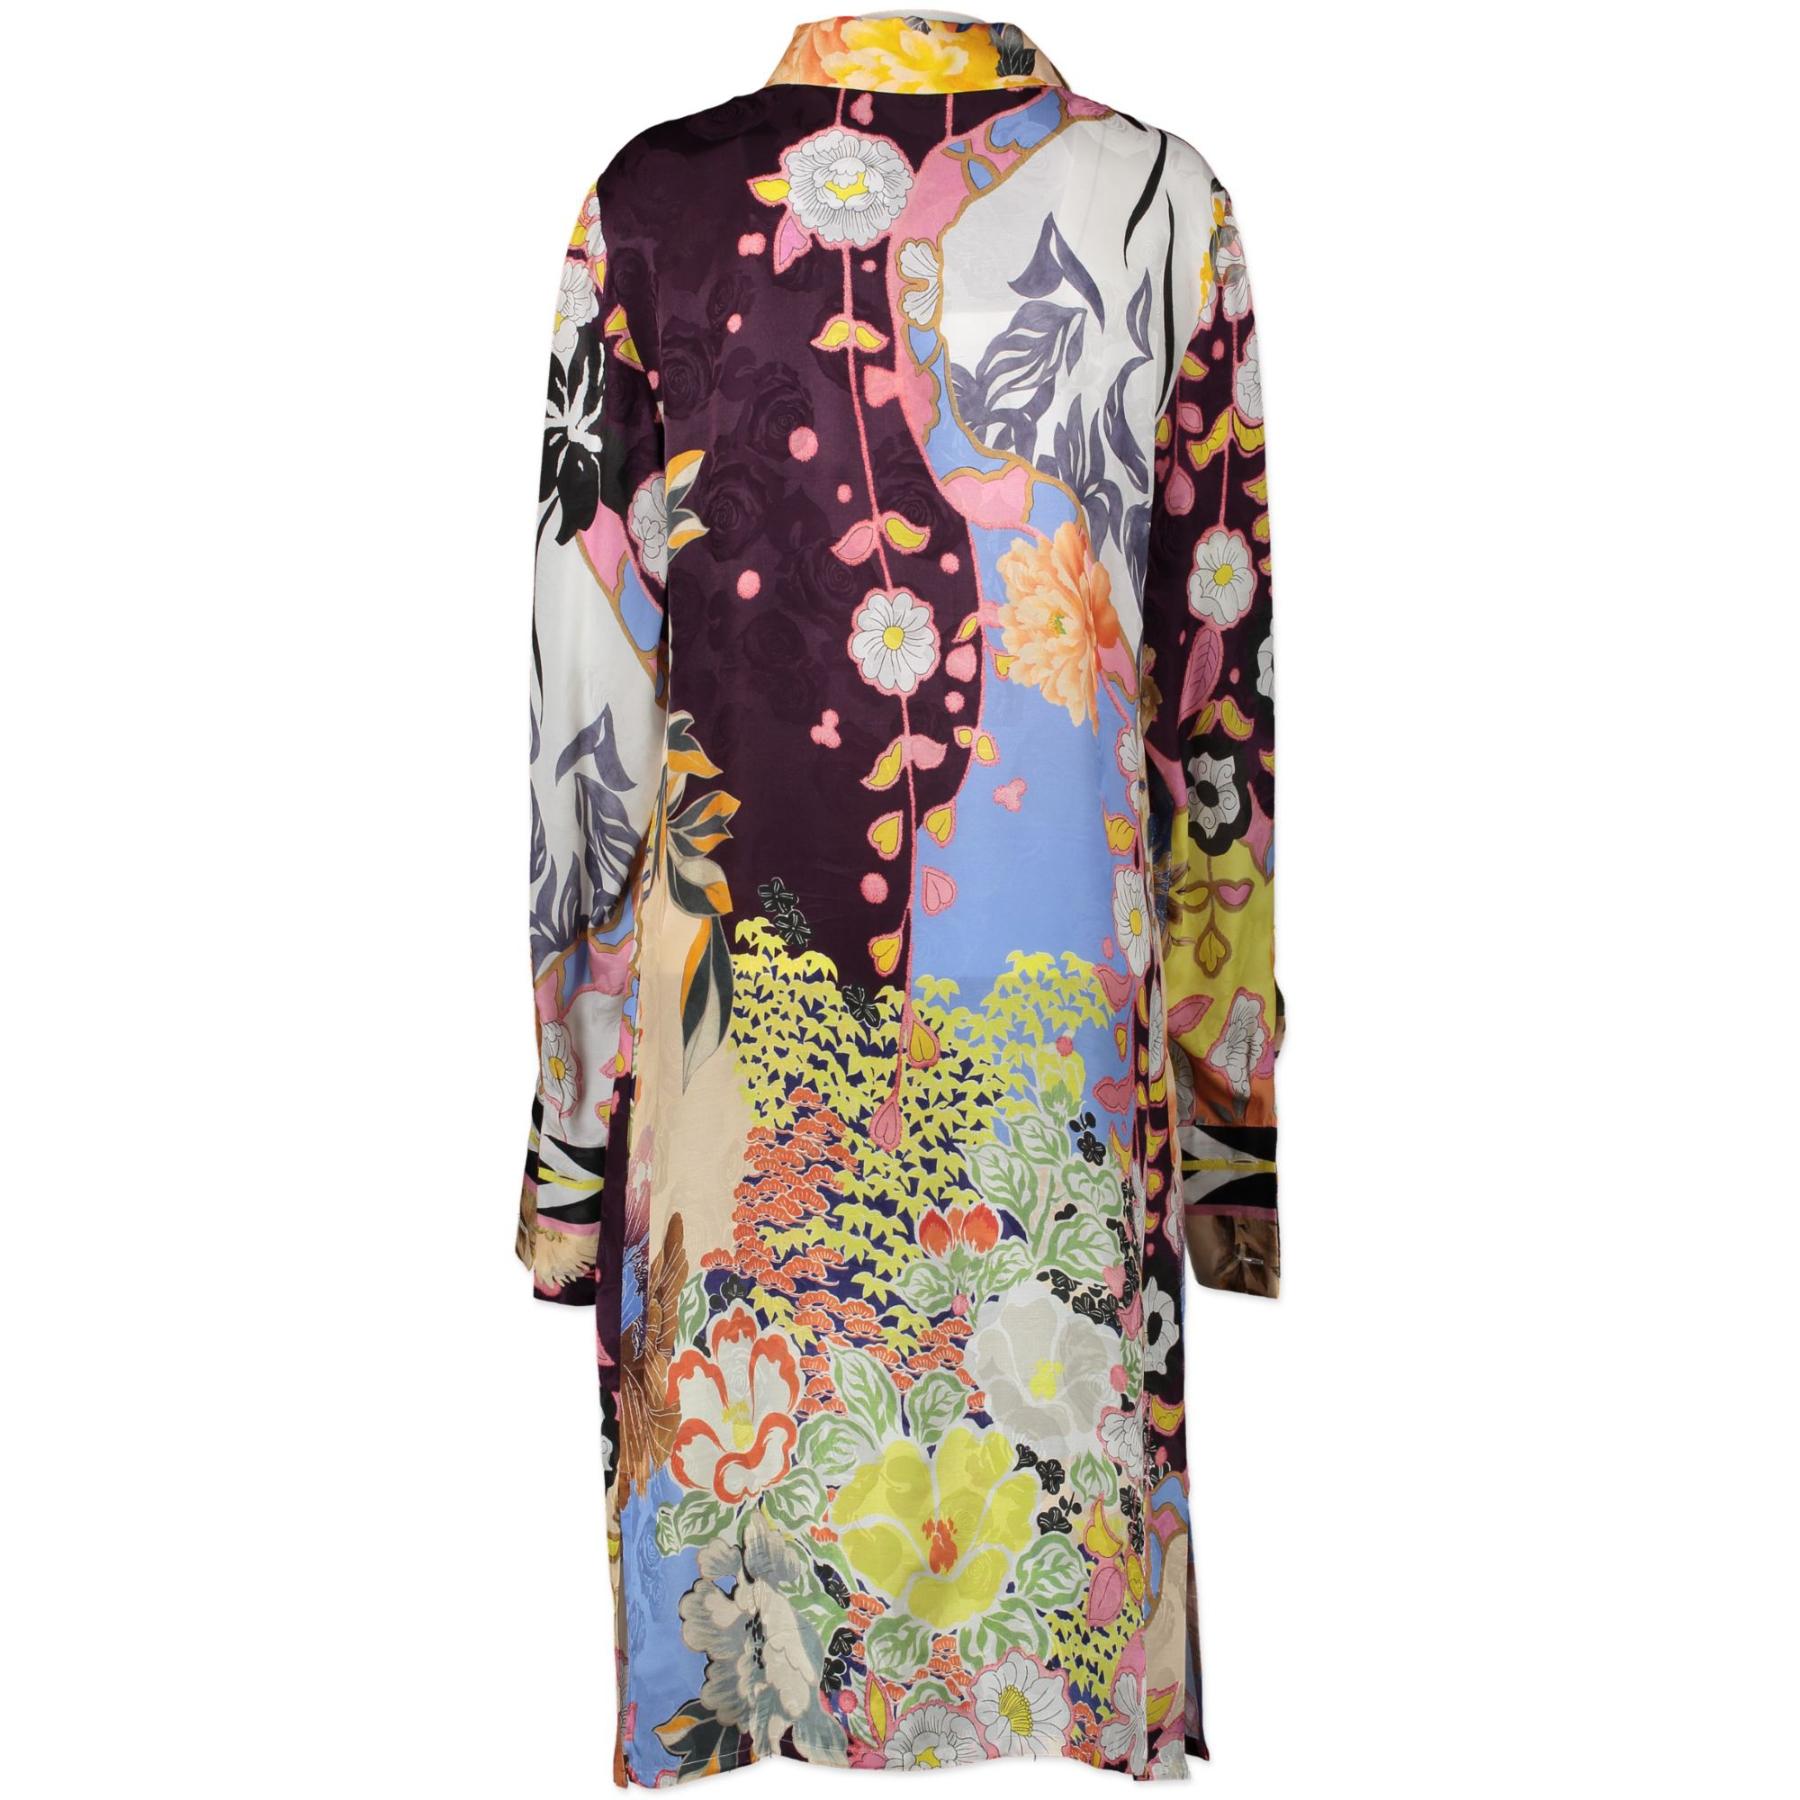 Authentieke tweedehands vintage Etro Abiti Printed Shirt Dress - Size 46 koop online webshop LabelLOV